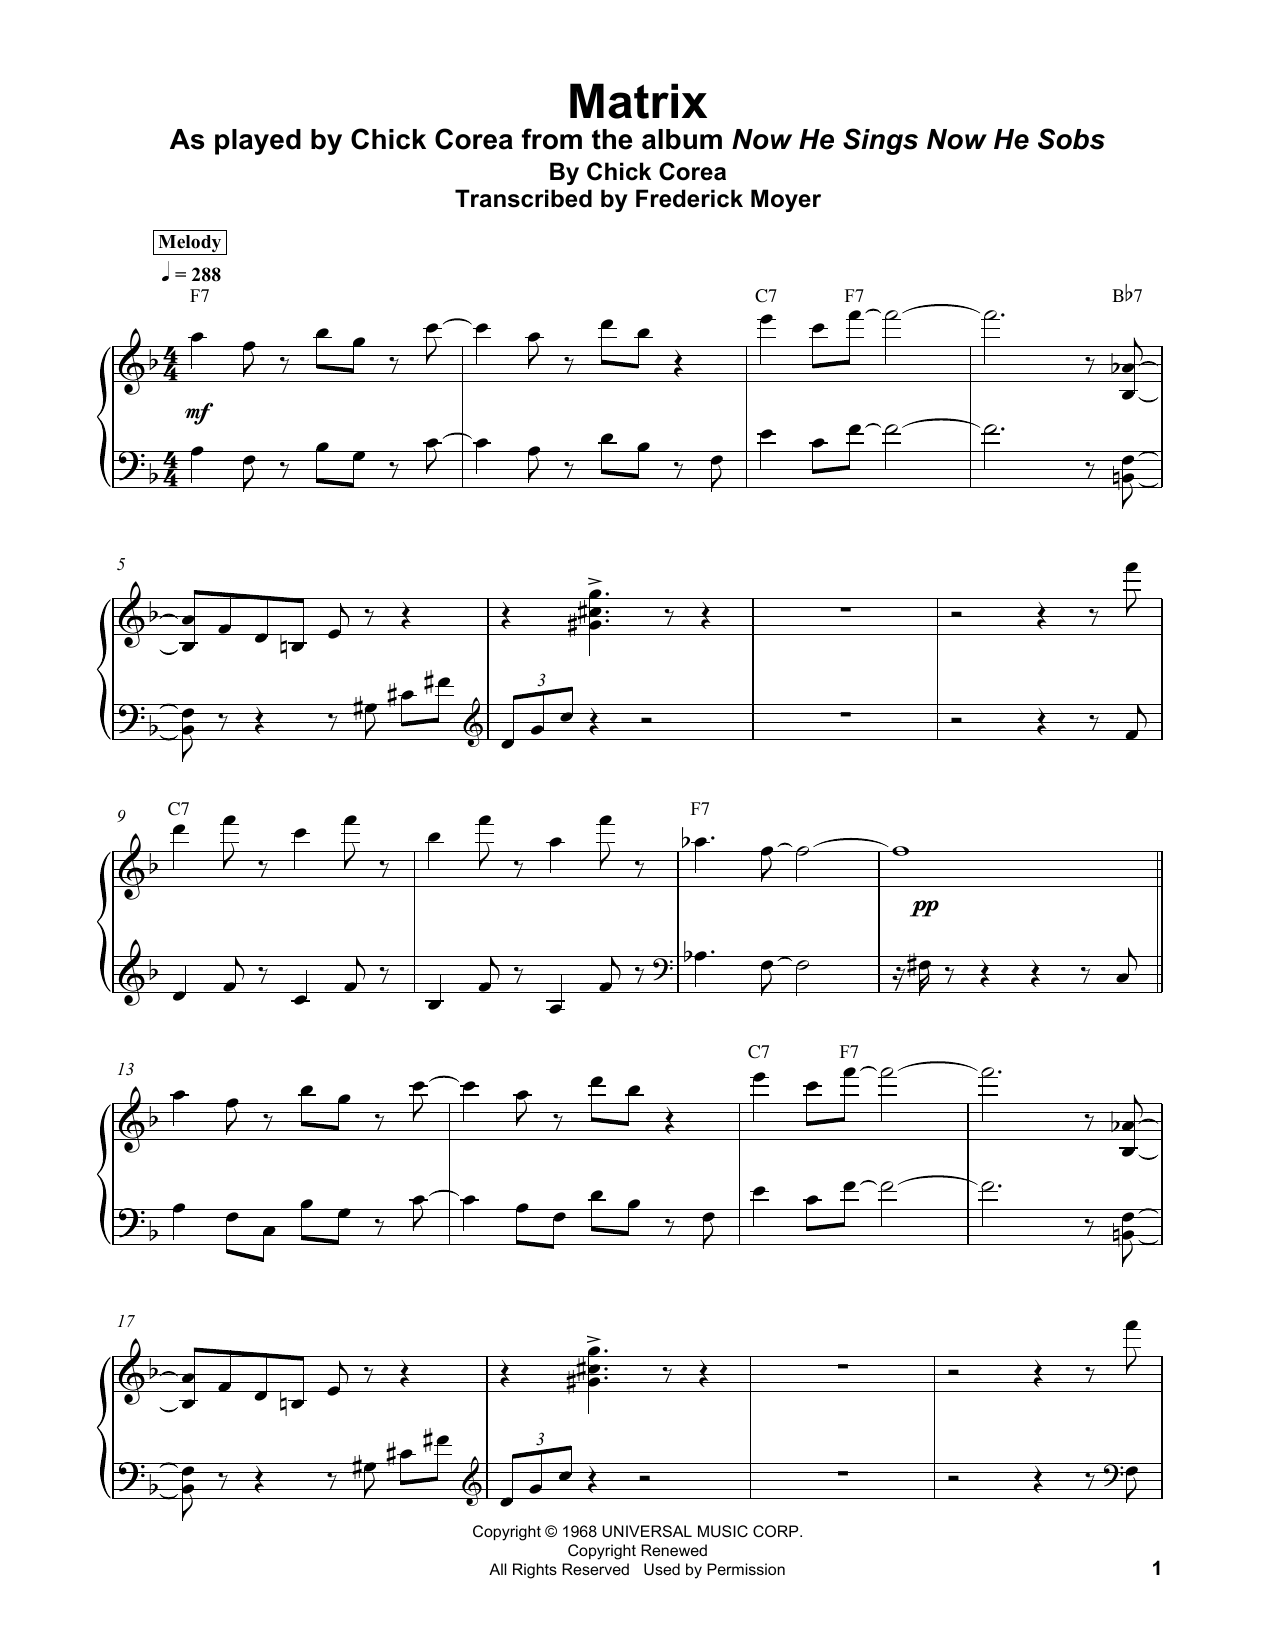 Chick Corea 'Matrix' Sheet Music Notes, Chords | Download Printable Piano  Transcription - SKU: 404179